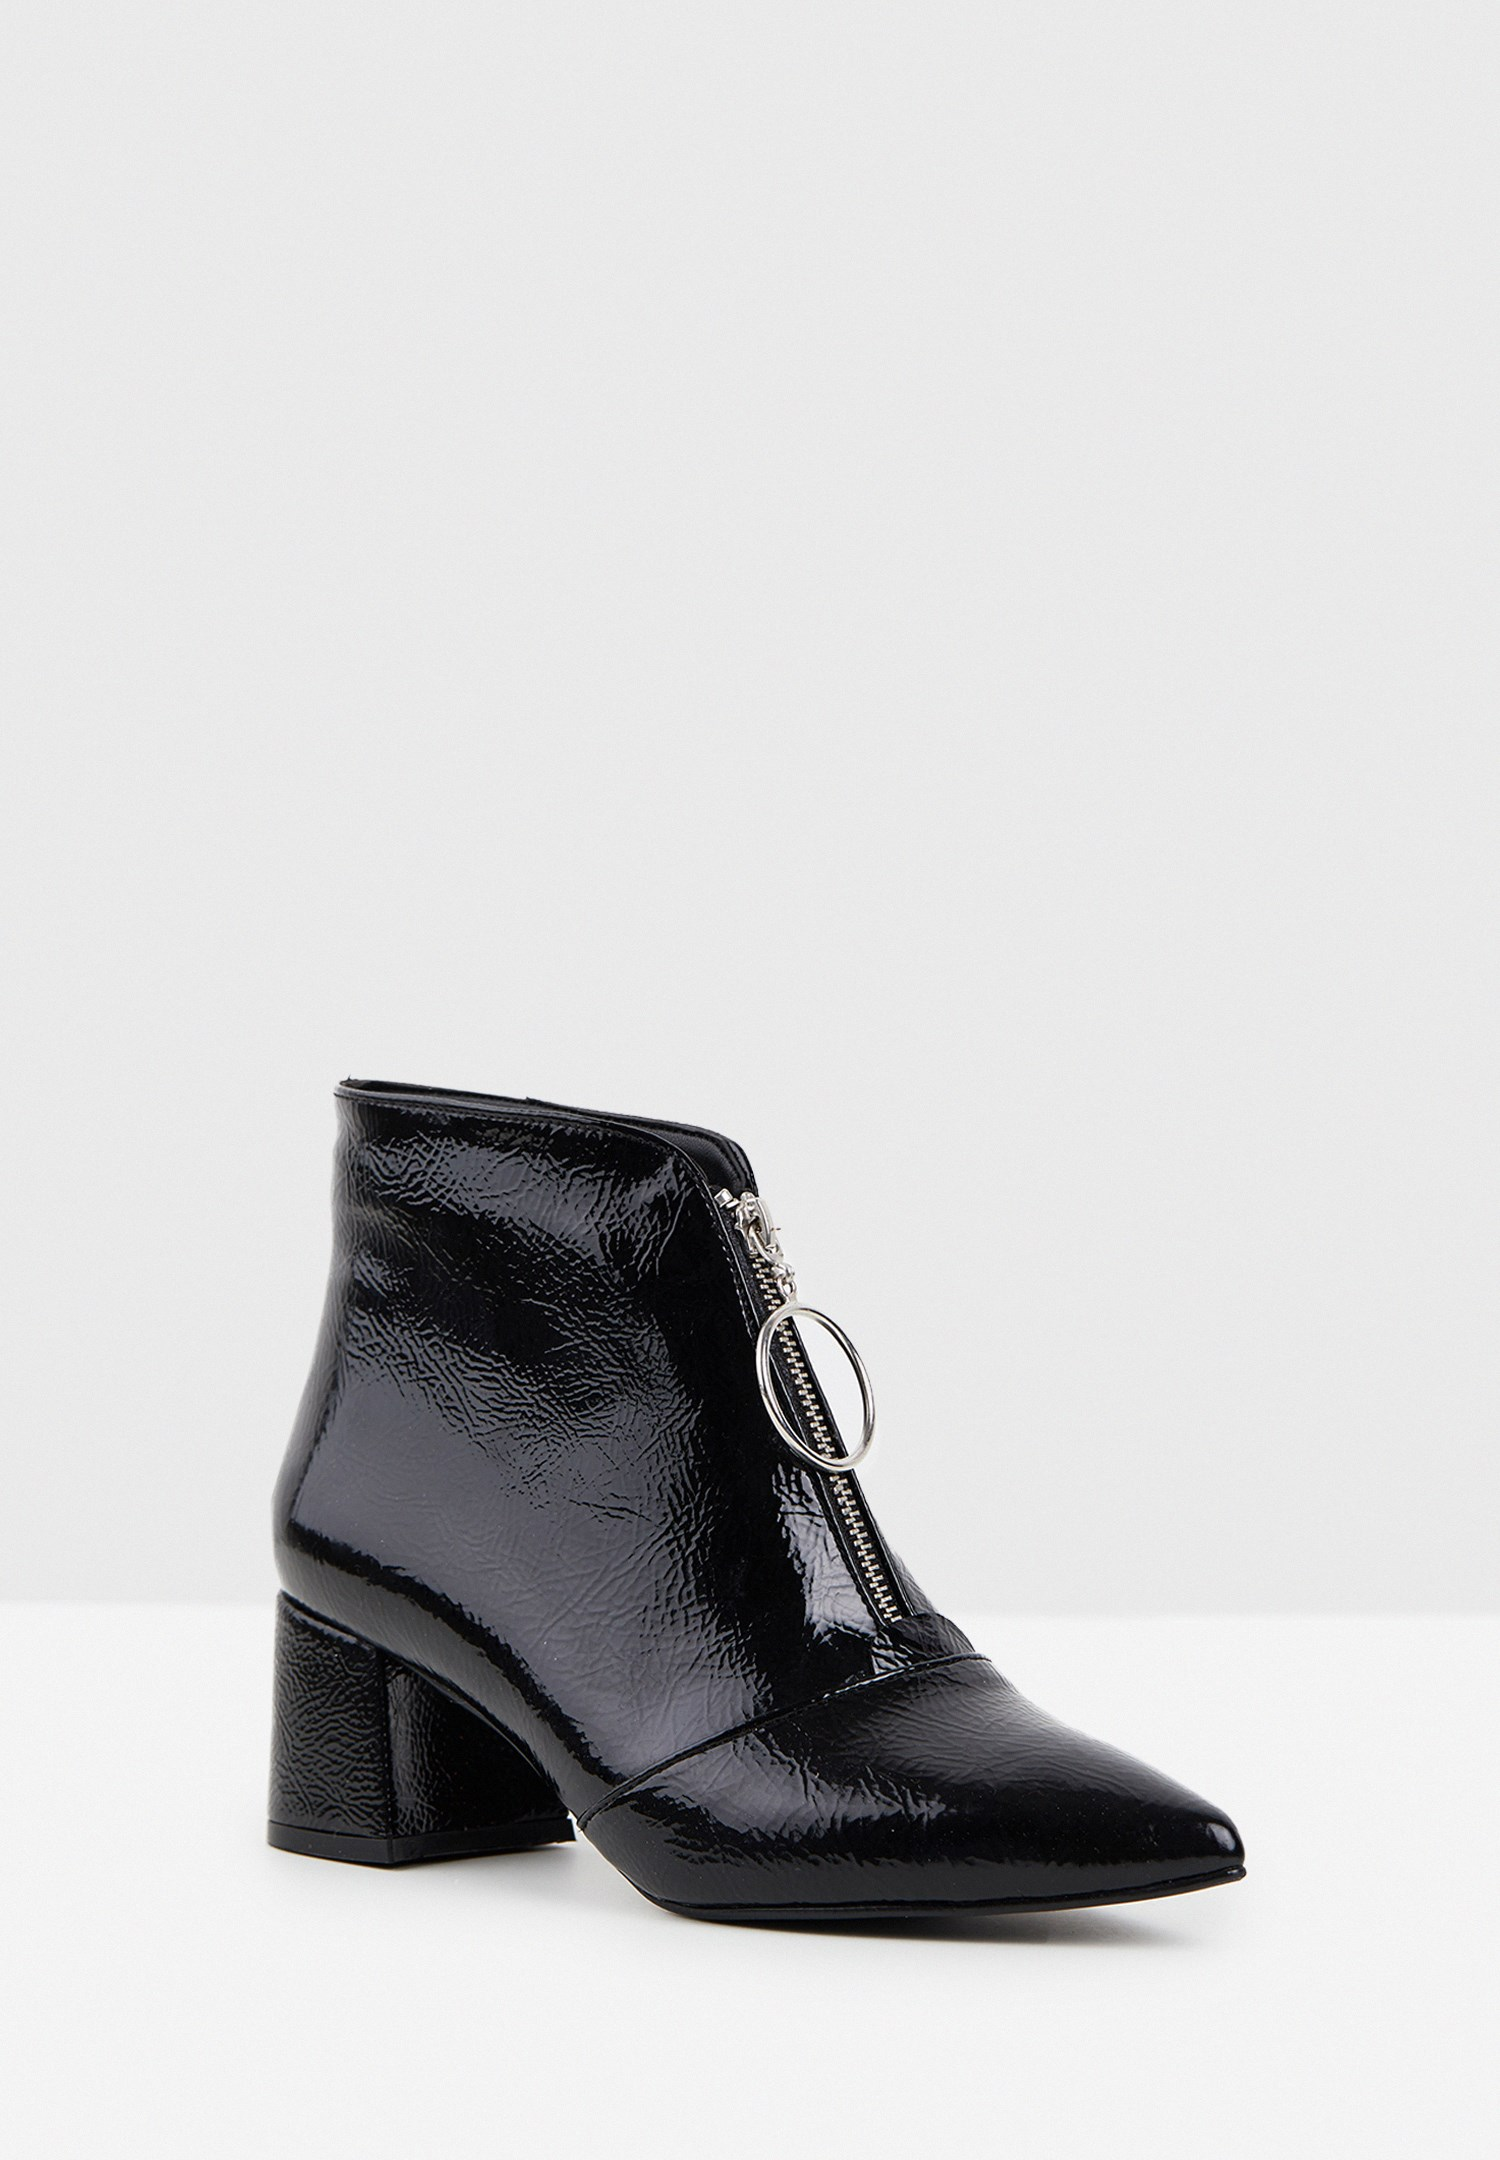 Women Black High Heel Boot with Zipper